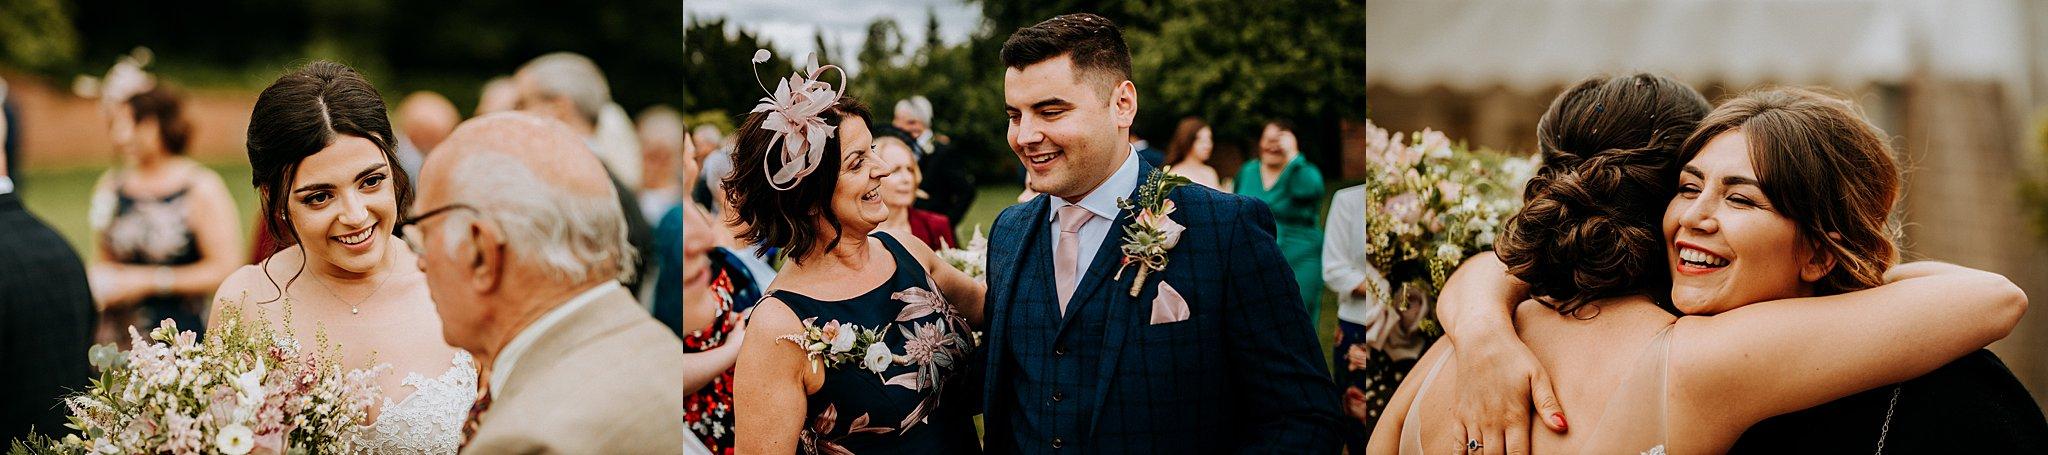 Natural Wedding Photography Nottingham